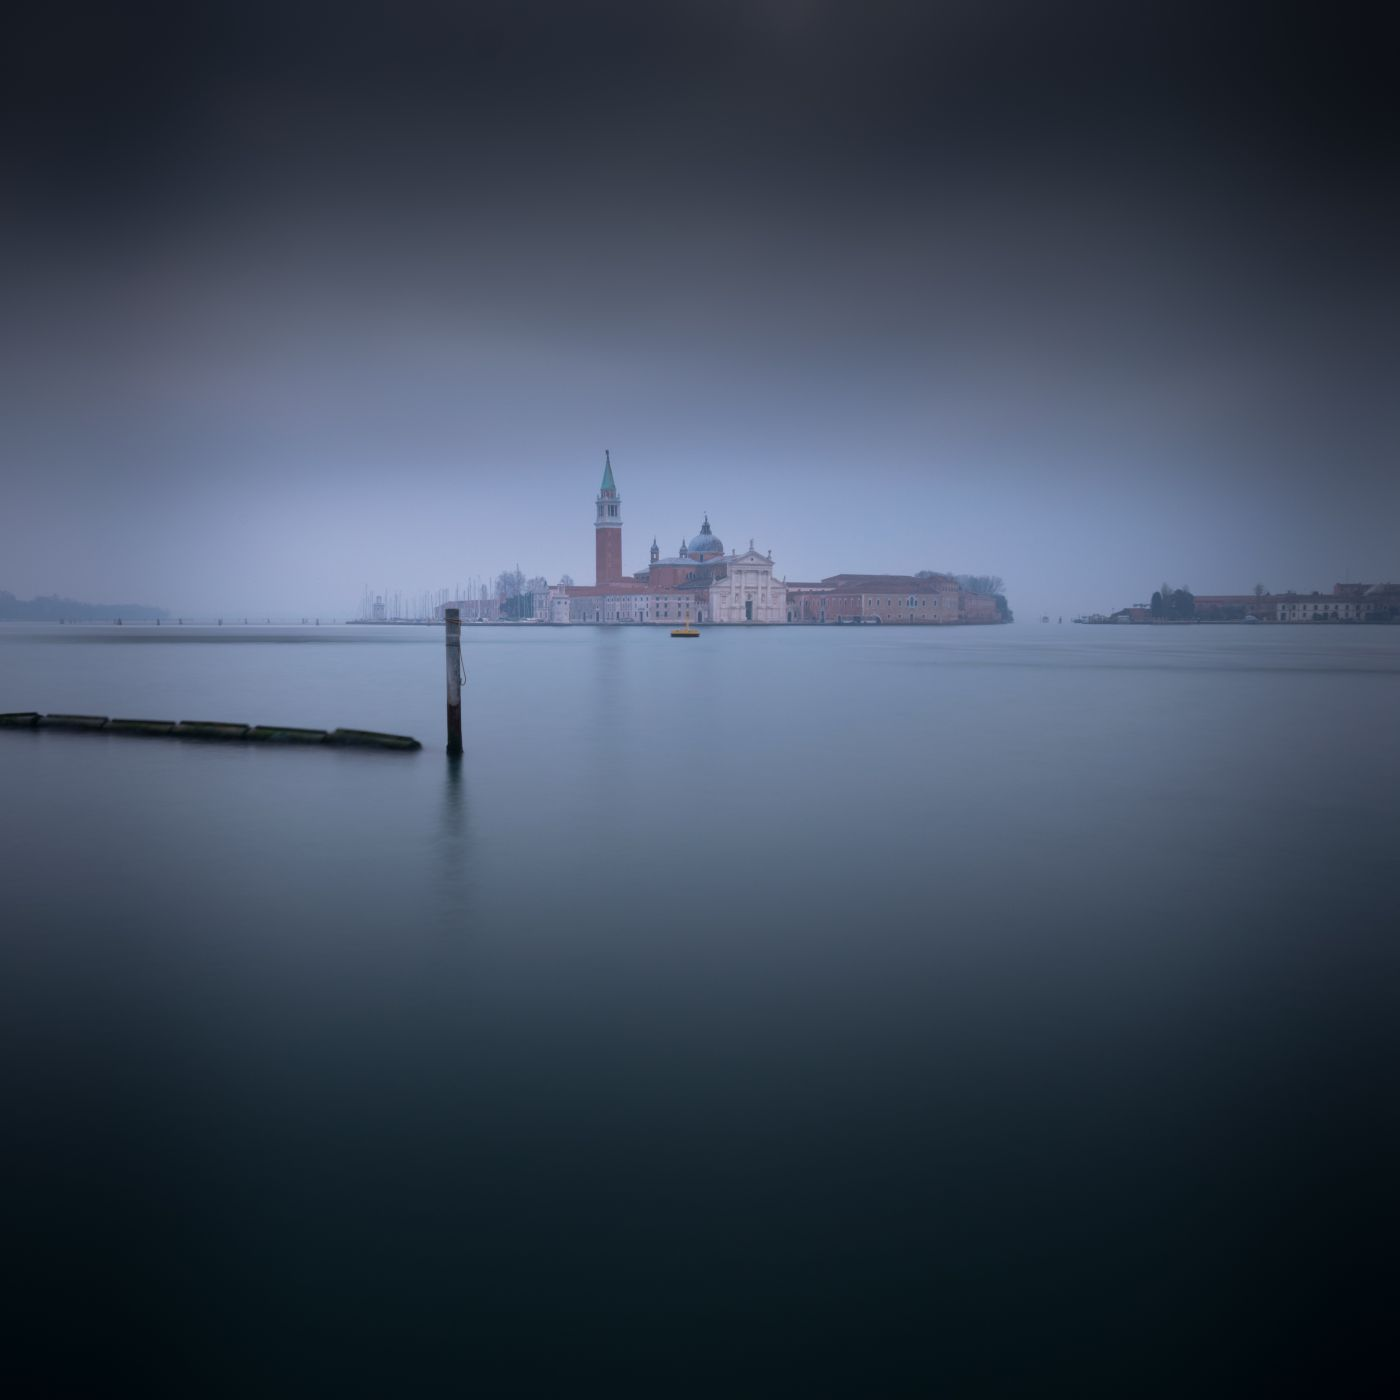 Minimalism in Venice, Italy